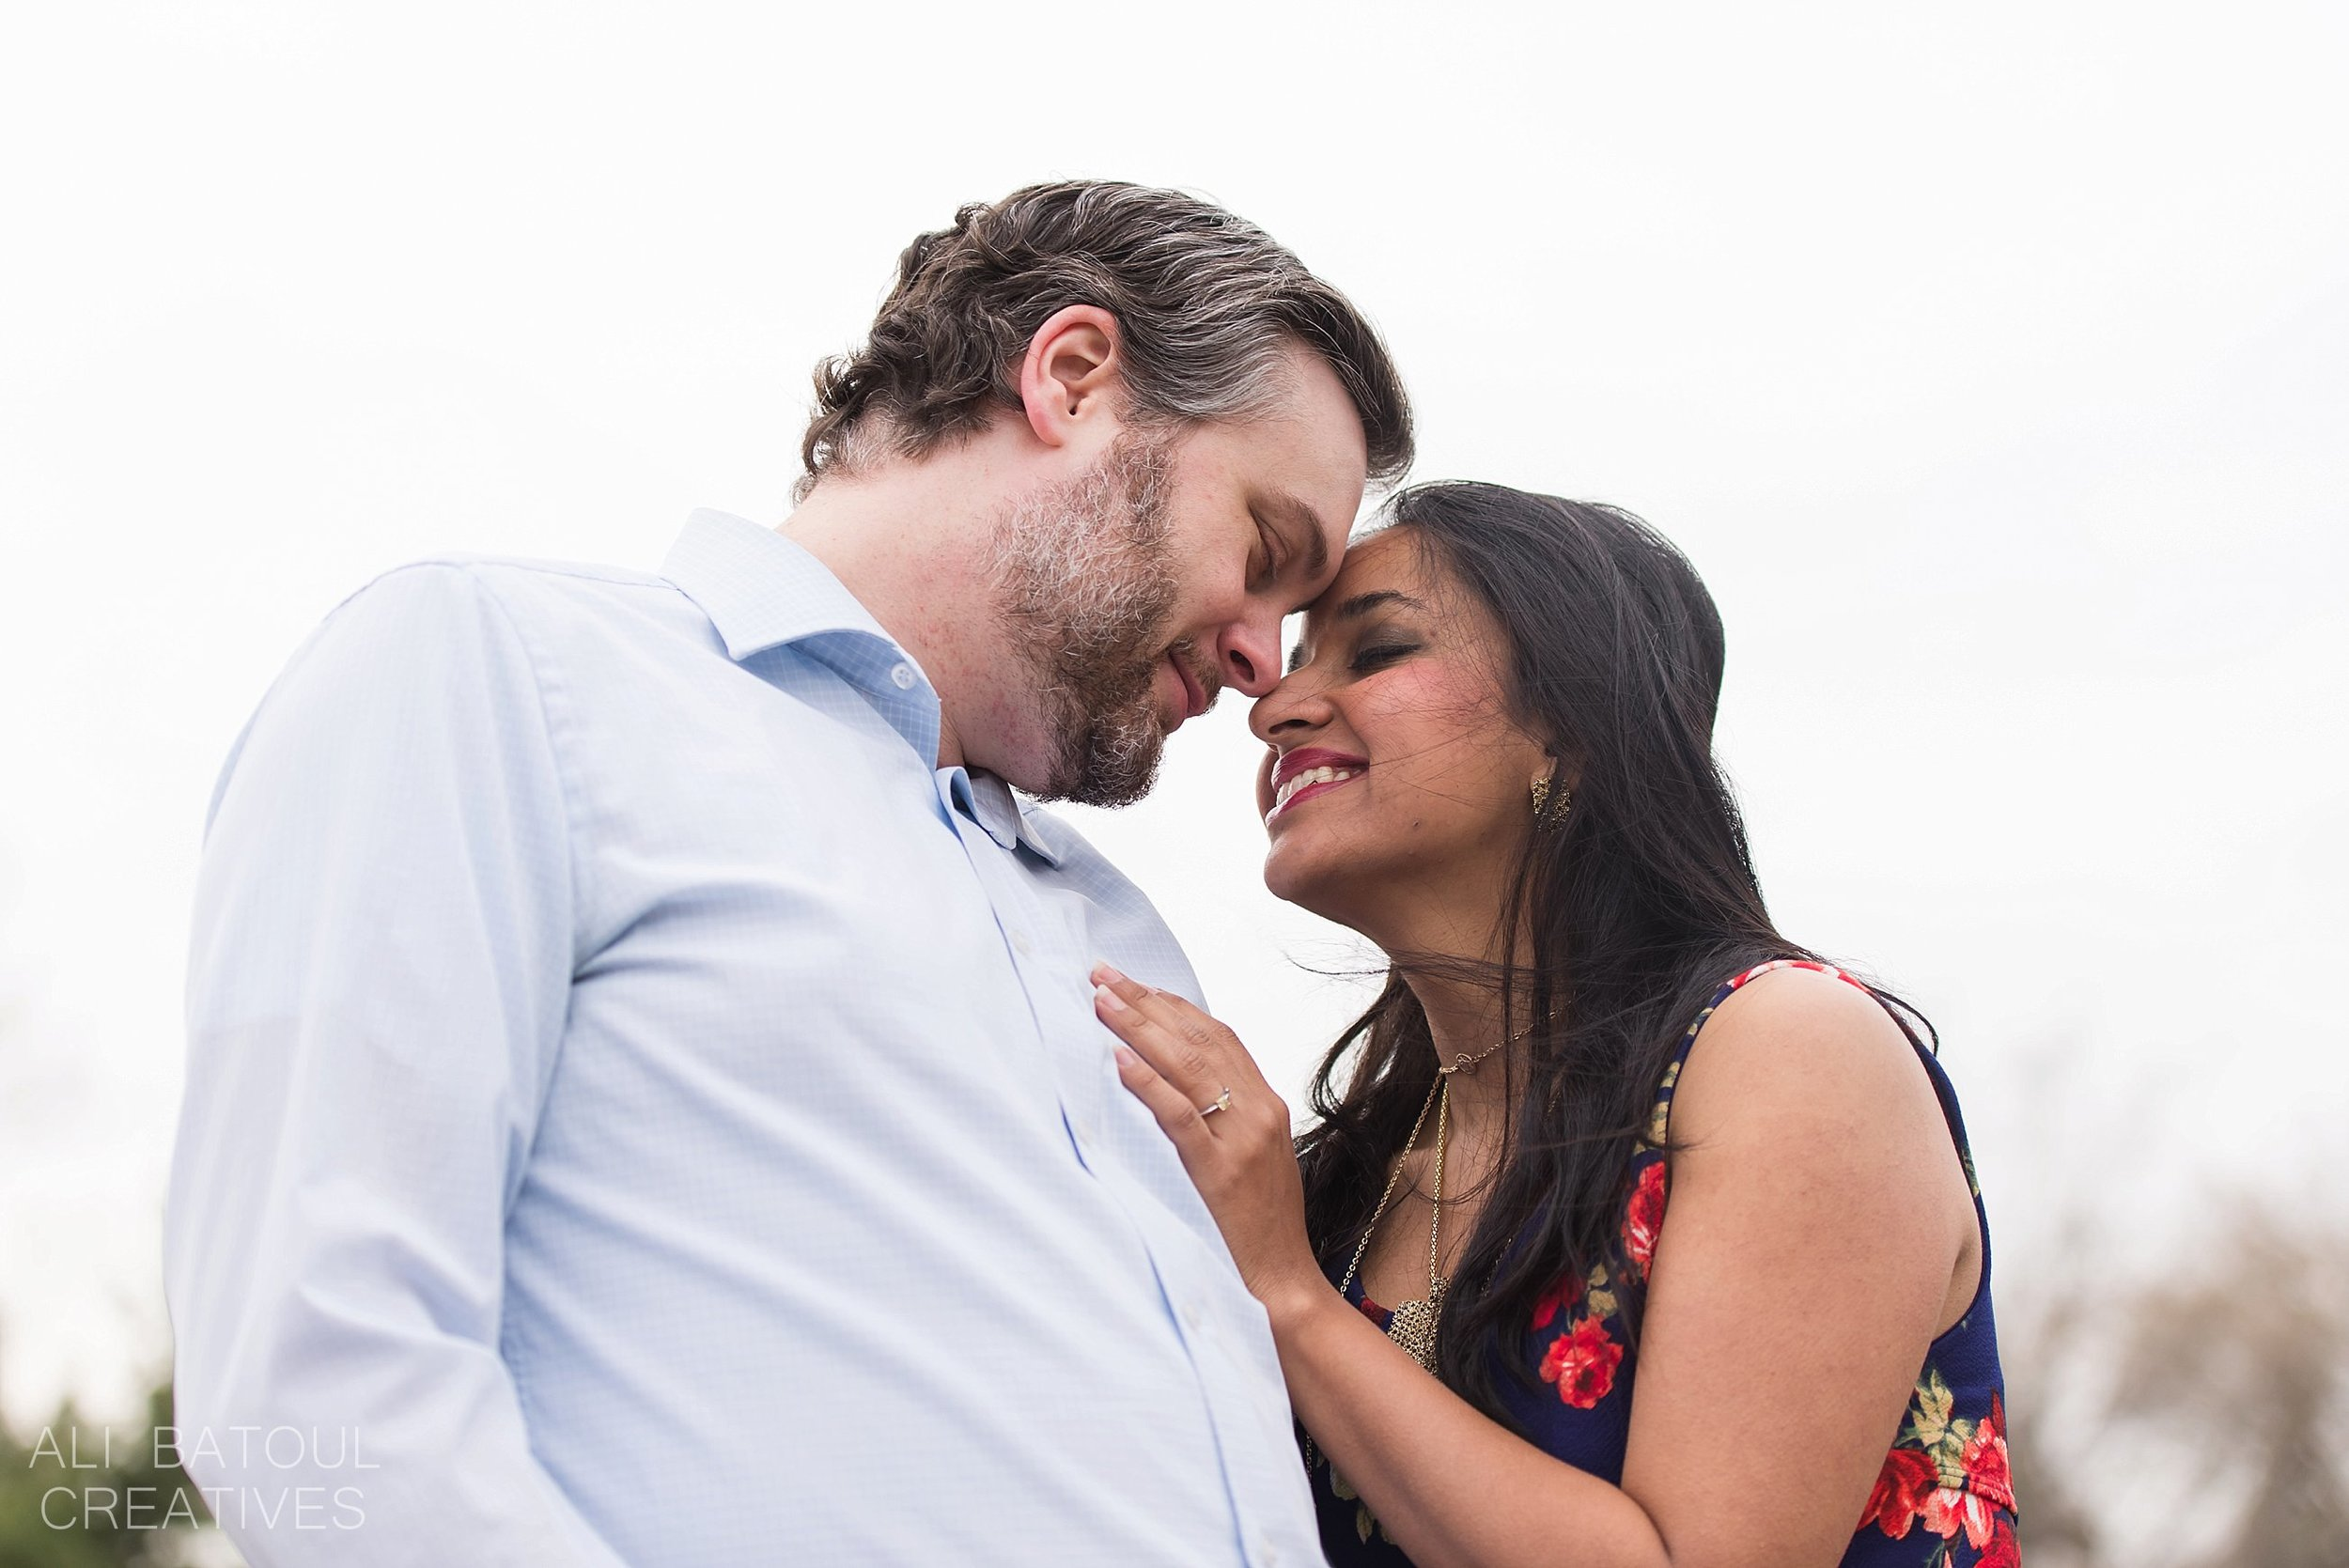 Uzma + Ian Engagement - Ali Batoul Creatives Fine Art Wedding Photography_0216.jpg